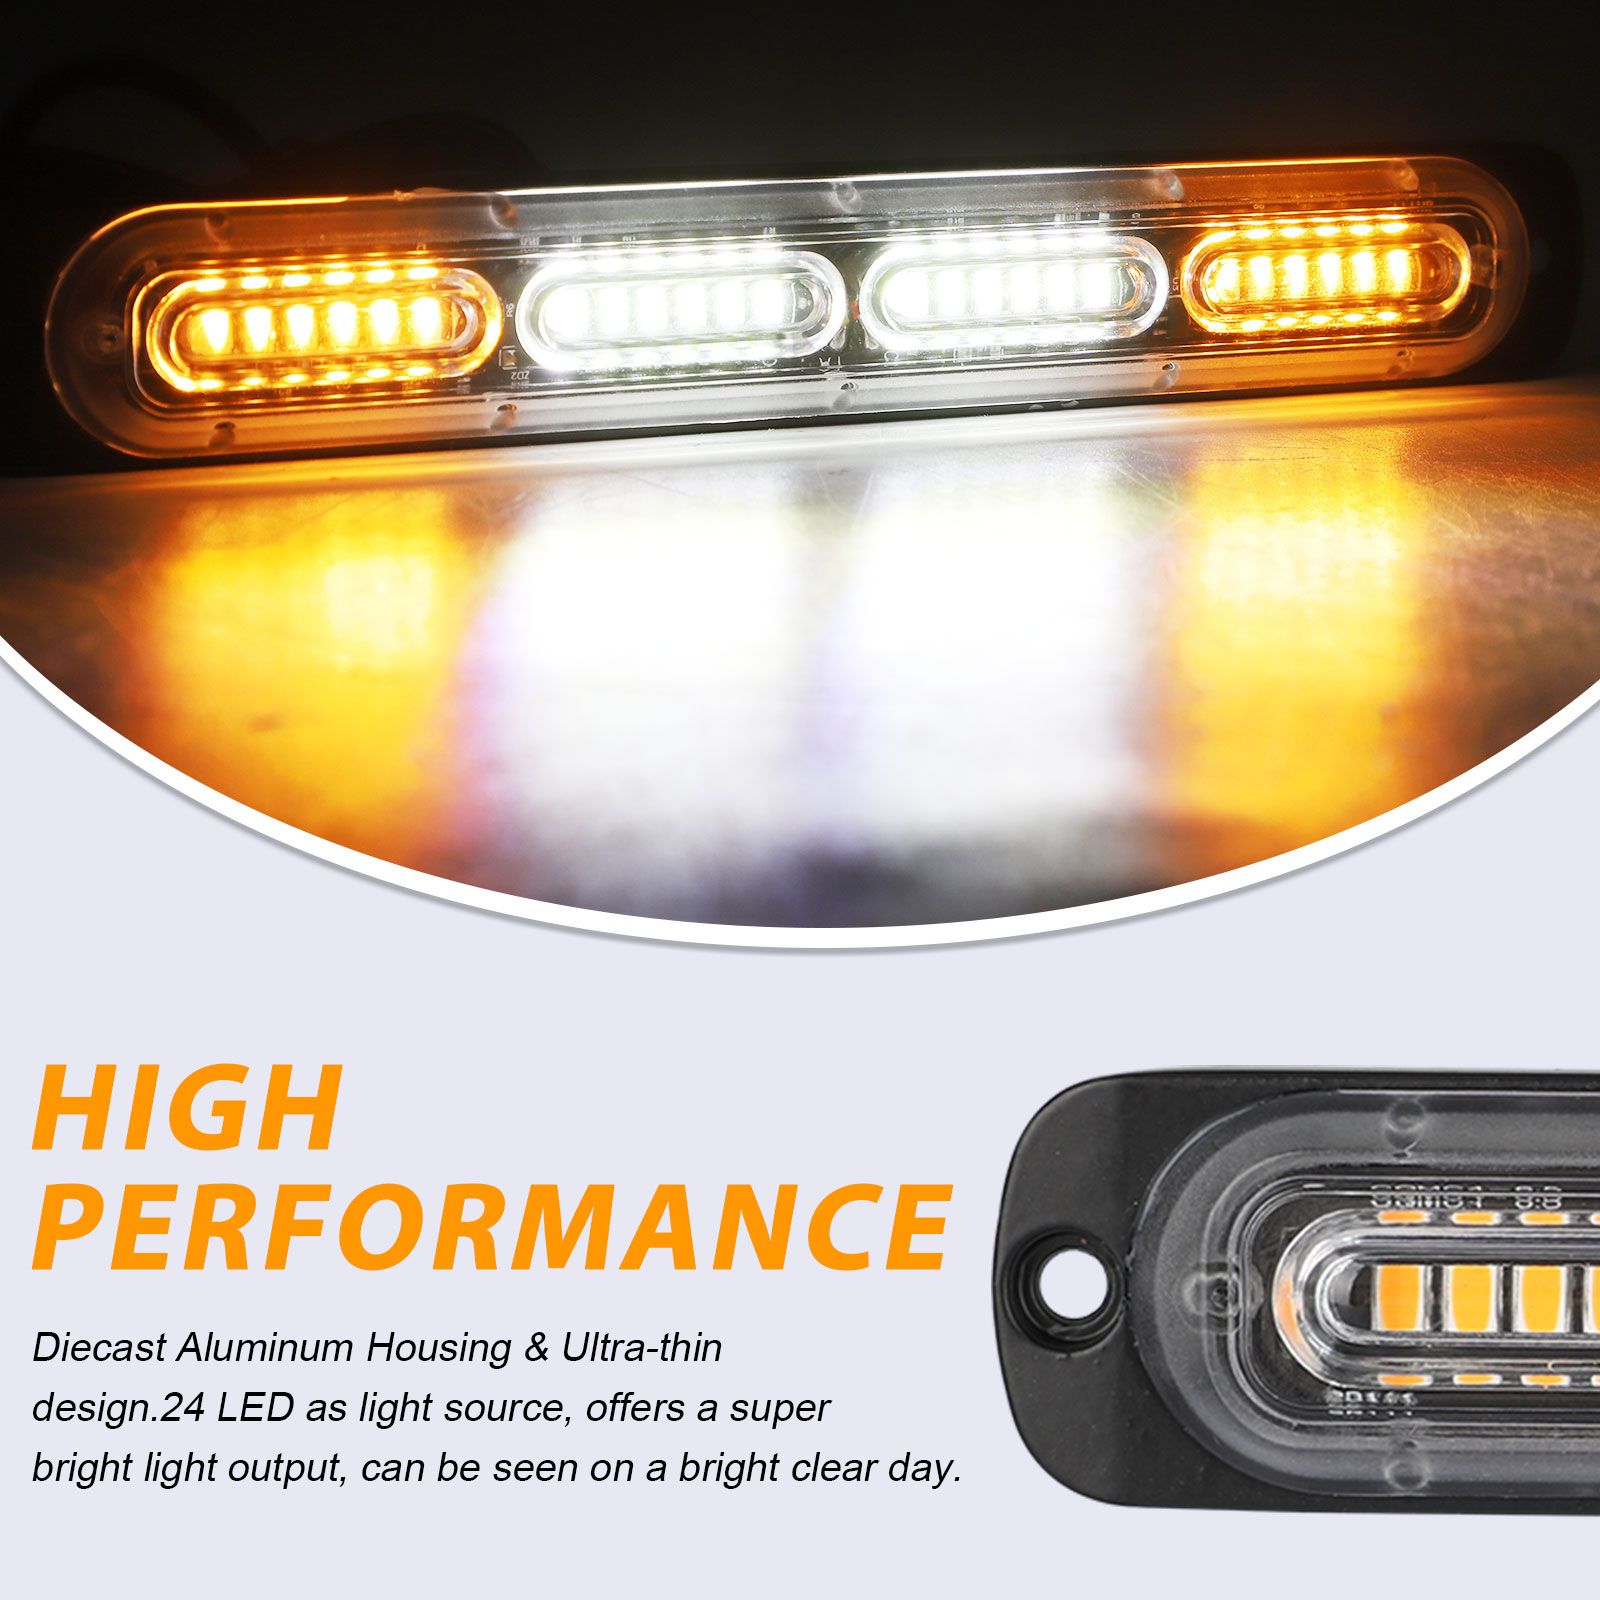 2PC-Amber-White-24LED-Car-Truck-Emergency-Warning-Hazard-Flash-Strobe-Light-Bar thumbnail 2